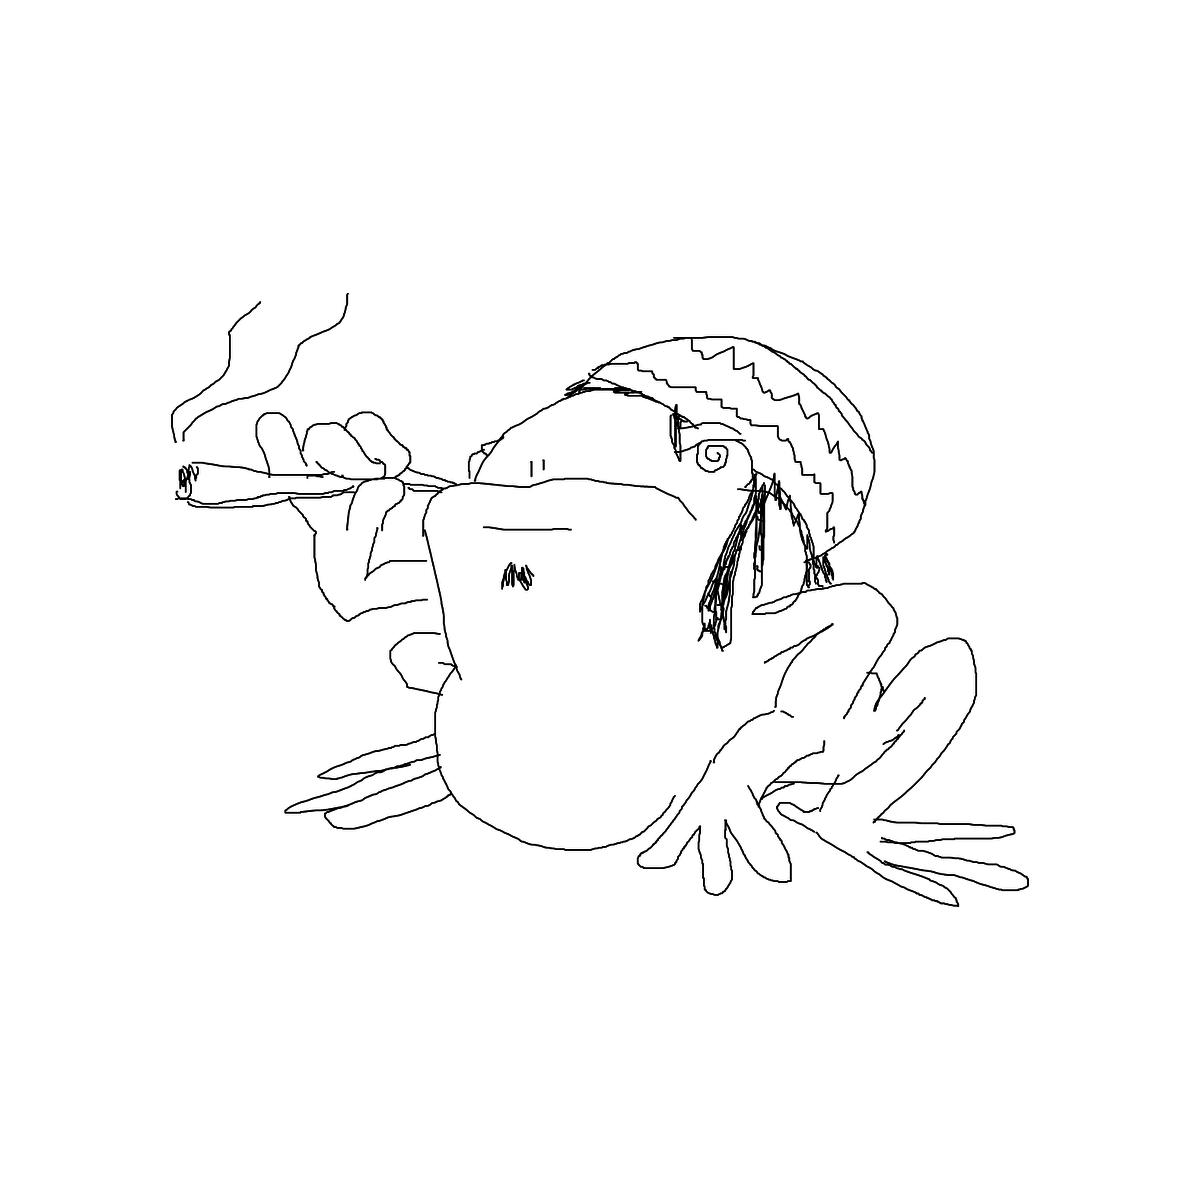 BAAAM drawing#1120 lat:52.2905082702636700lng: 4.9638919830322270